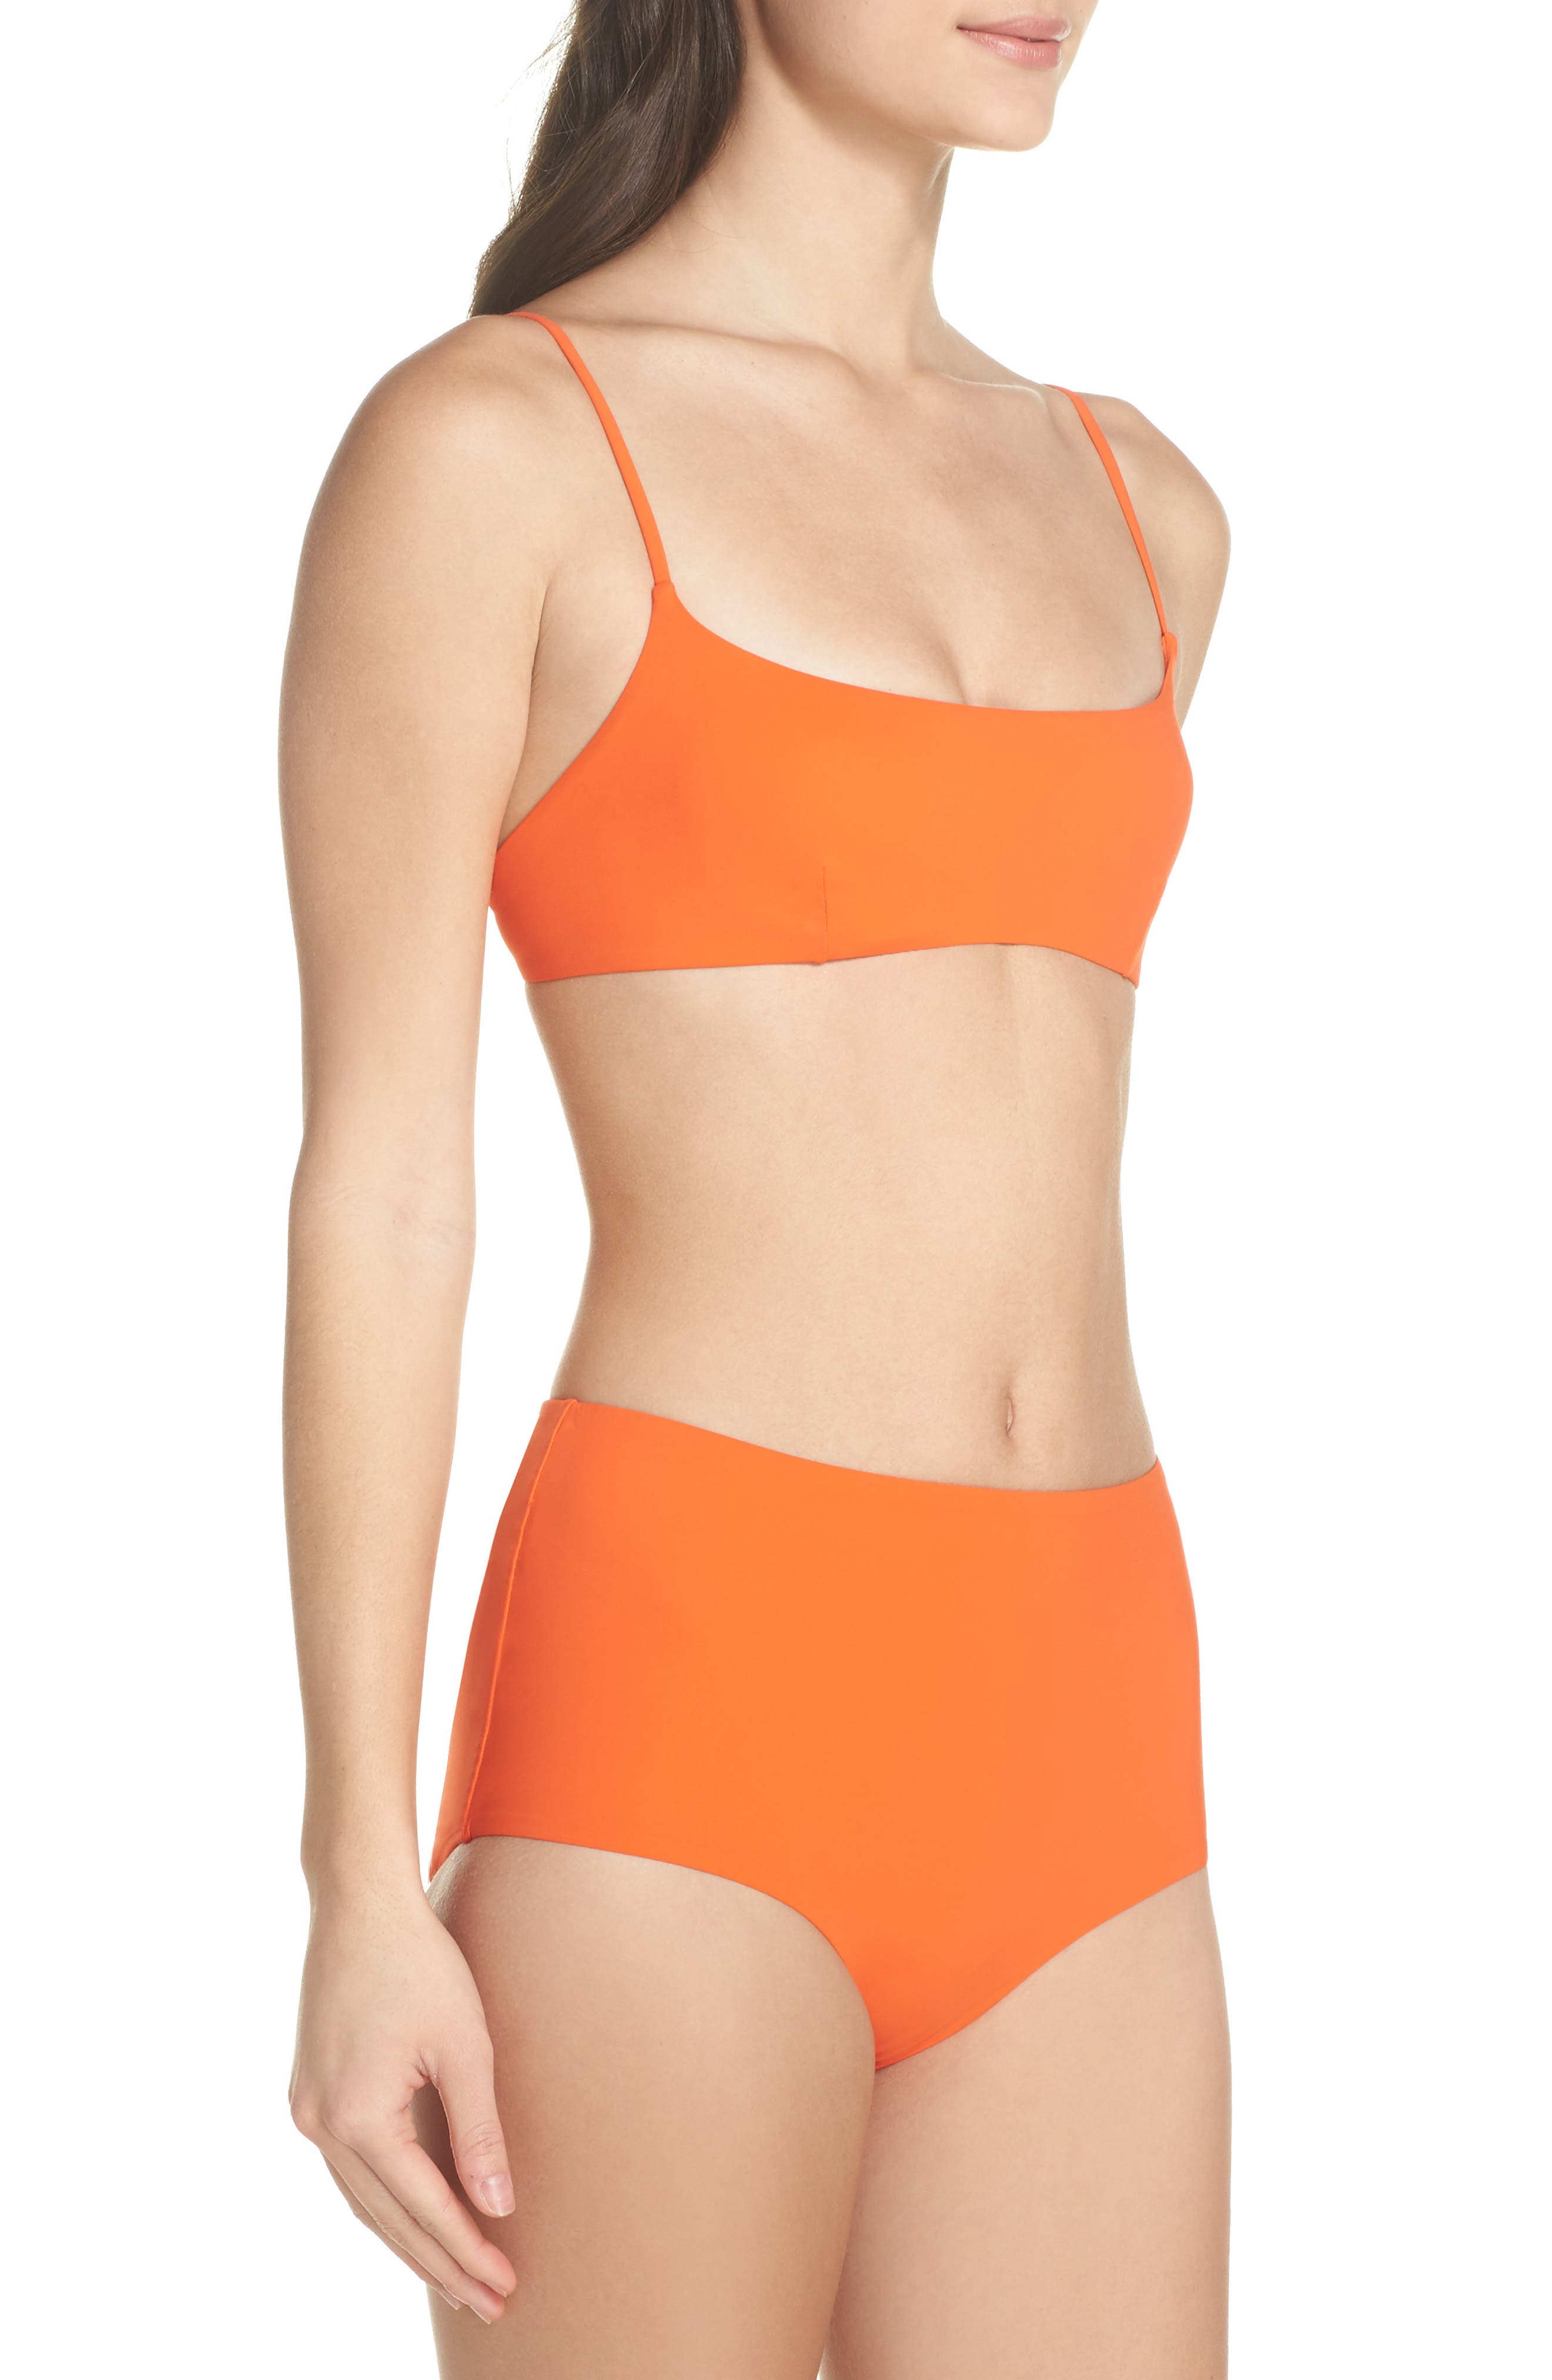 Marina High Waist Bikini Bottoms,                             Alternate thumbnail 9, color,                             844